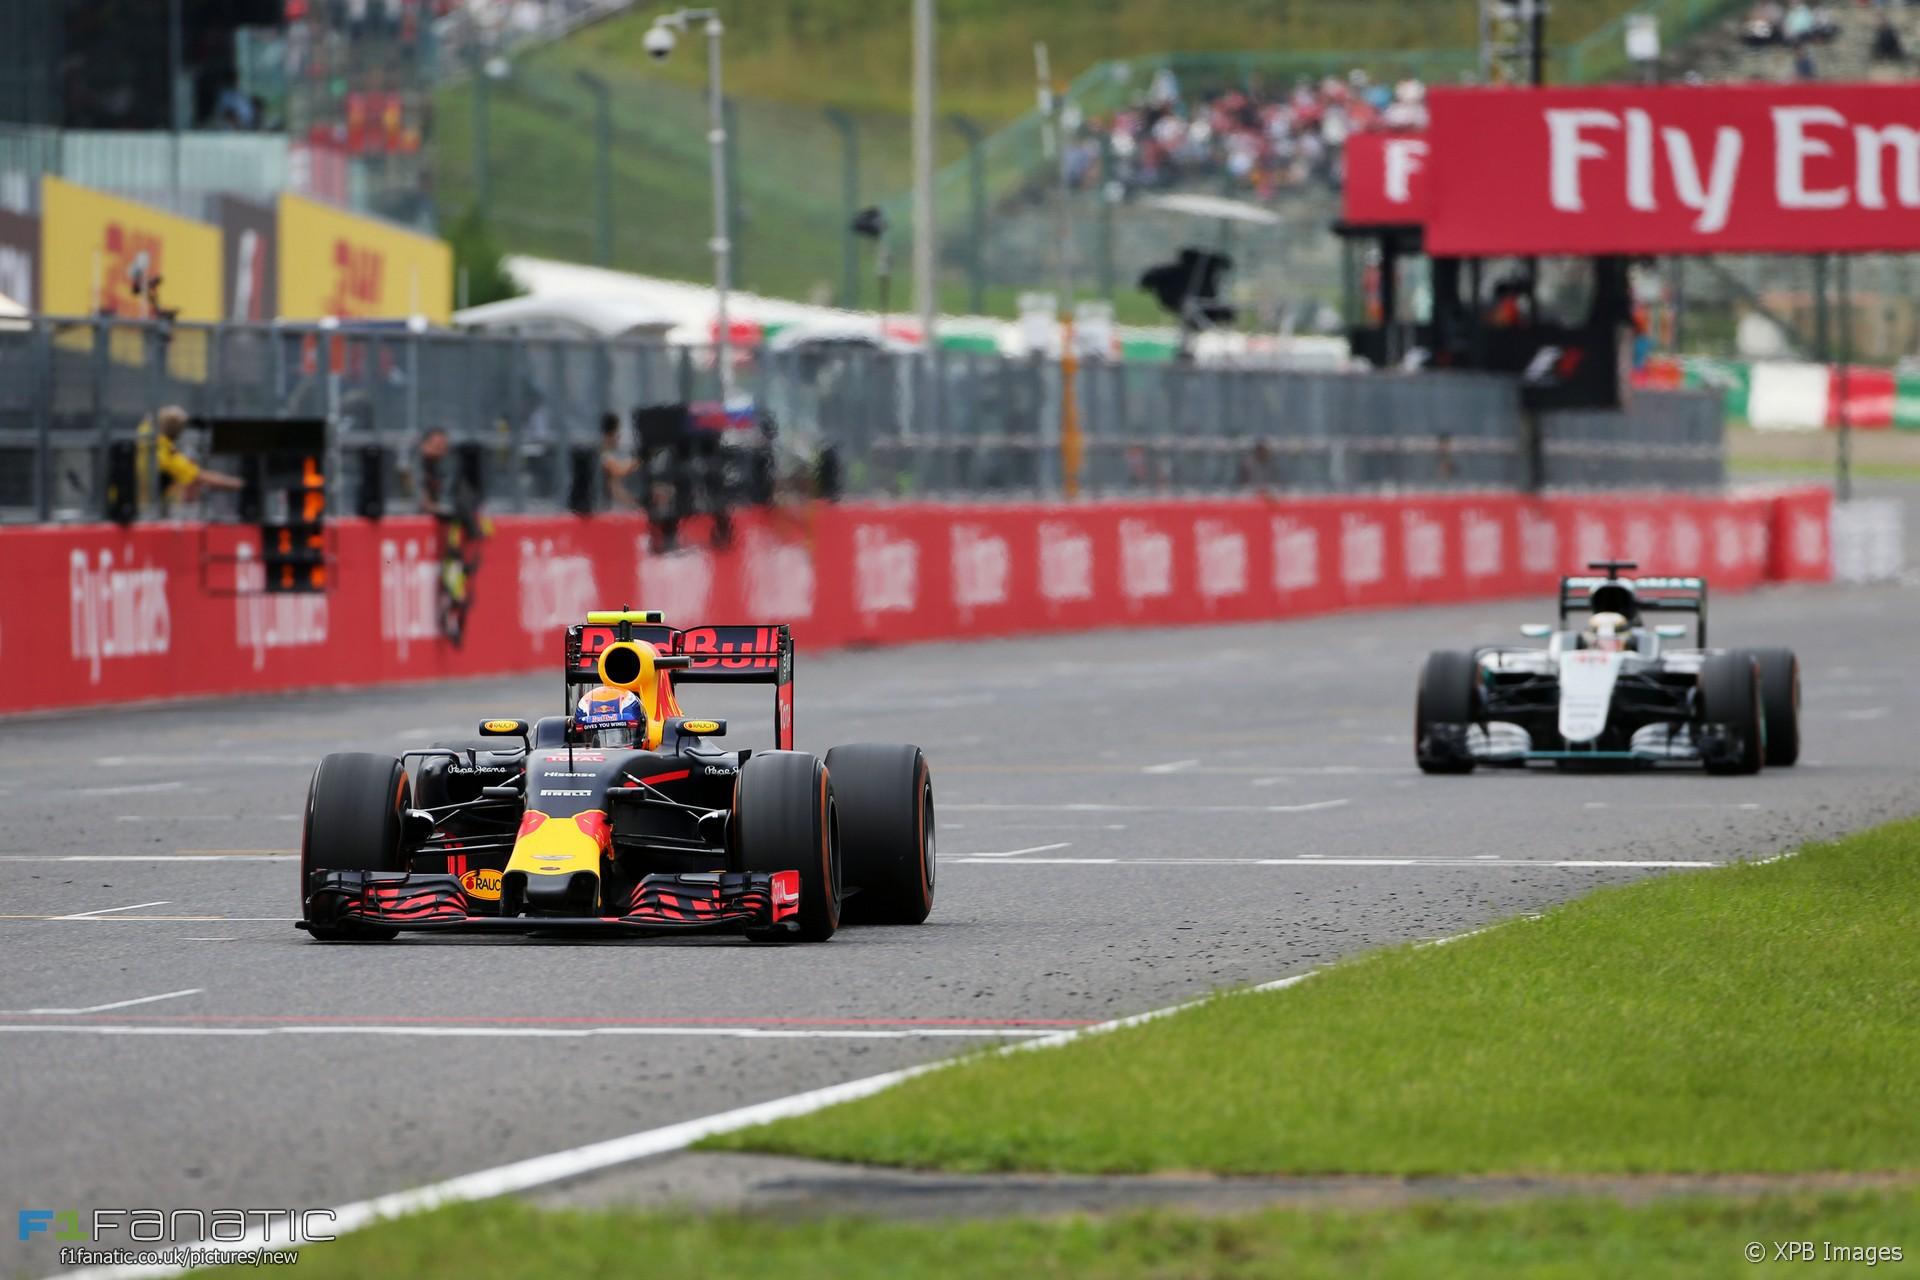 Max Verstappen, Red Bull, Suzuka, 2016